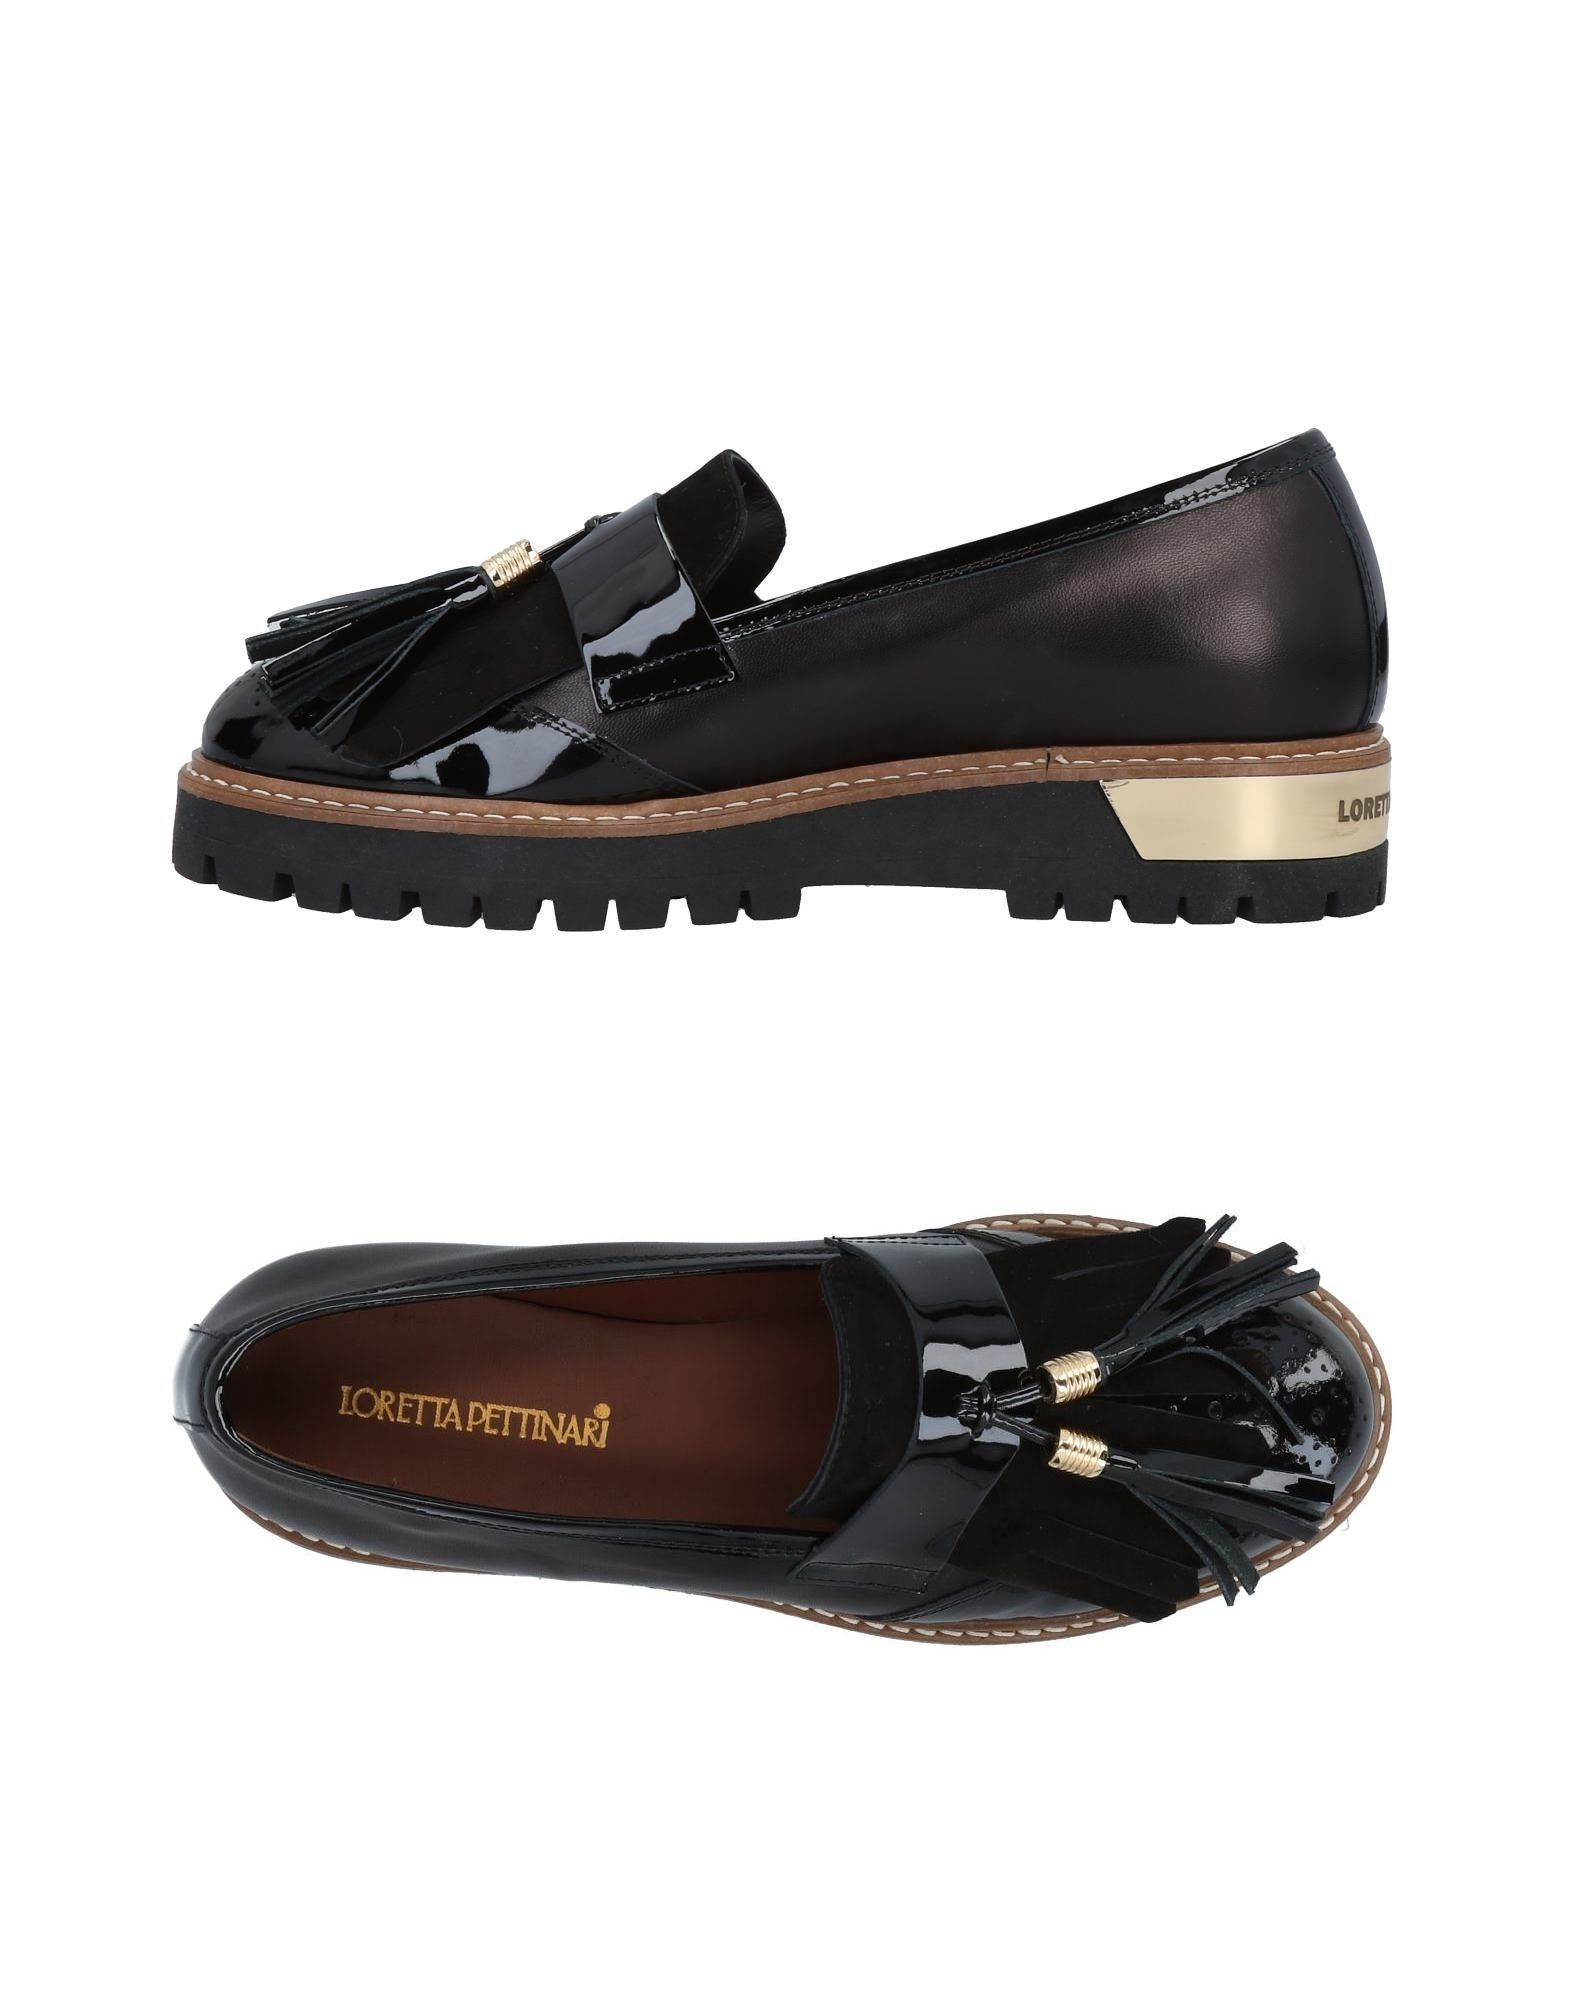 Loretta Pettinari Mokassins Damen  11494267LPGut aussehende strapazierfähige Schuhe